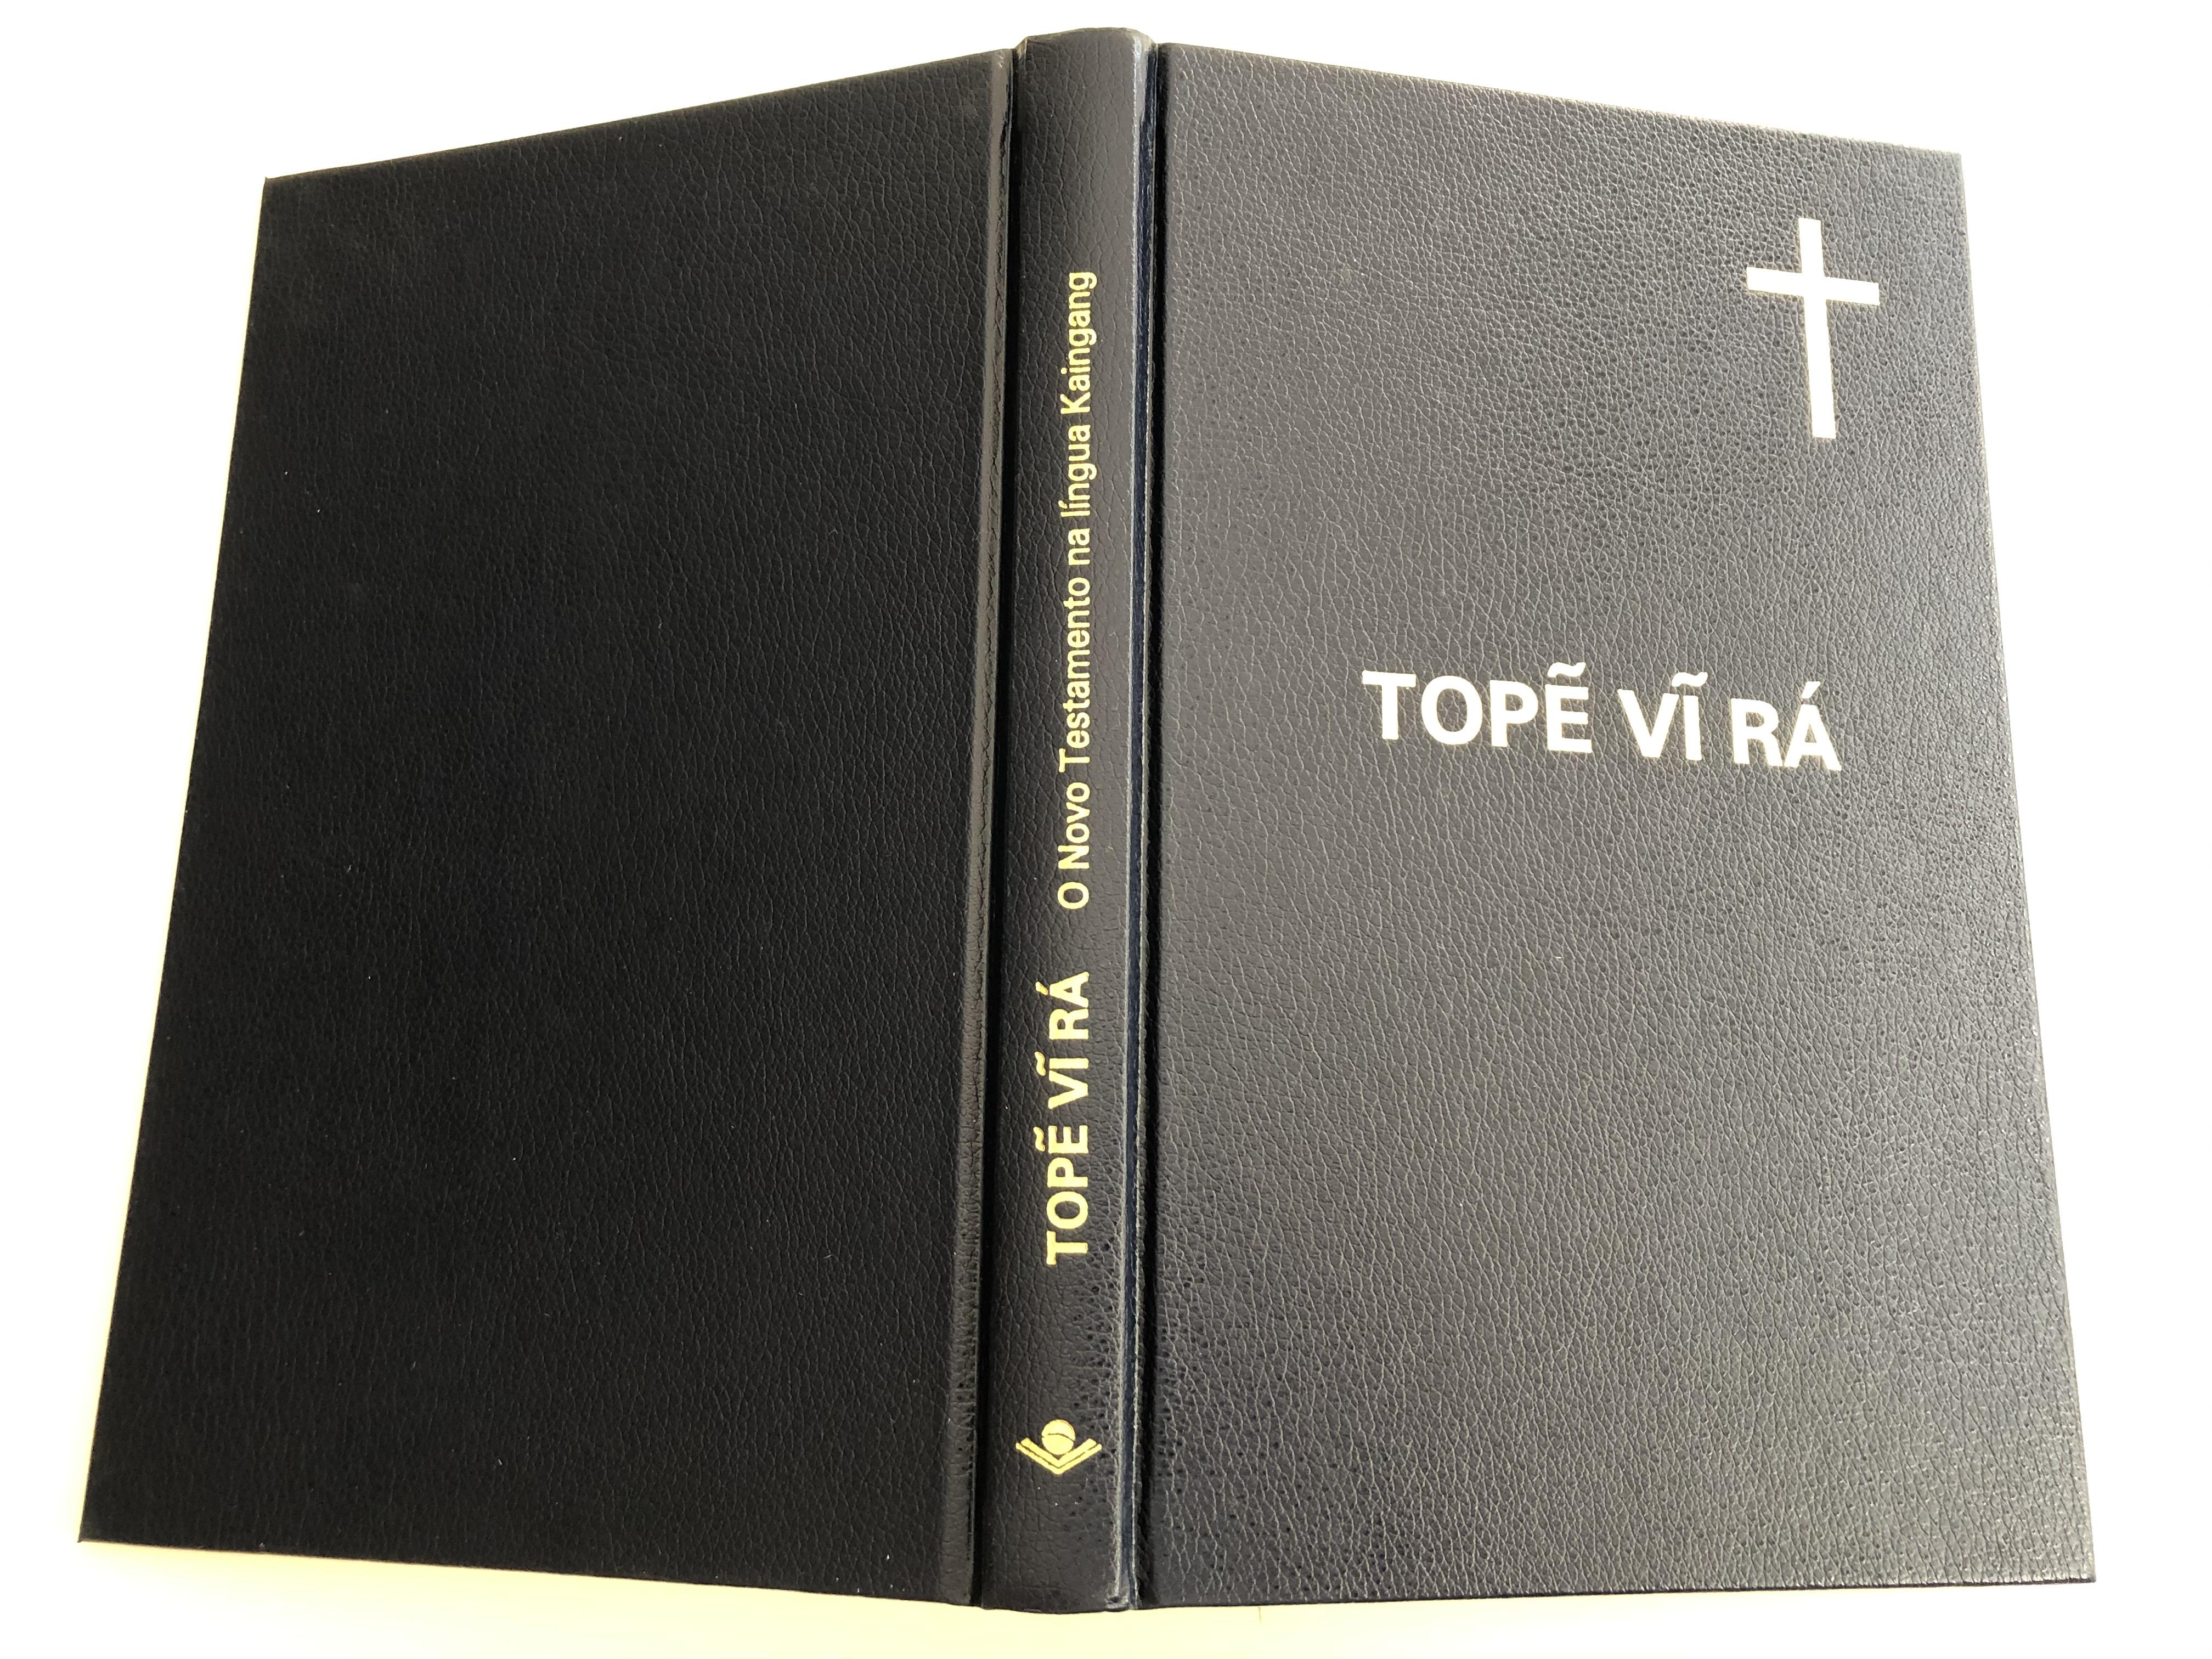 top-v-r-o-novo-testamento-the-new-testament-in-kaingang-language-bible-society-brasil-2005-hardcover-2nd-edition-18-.jpg